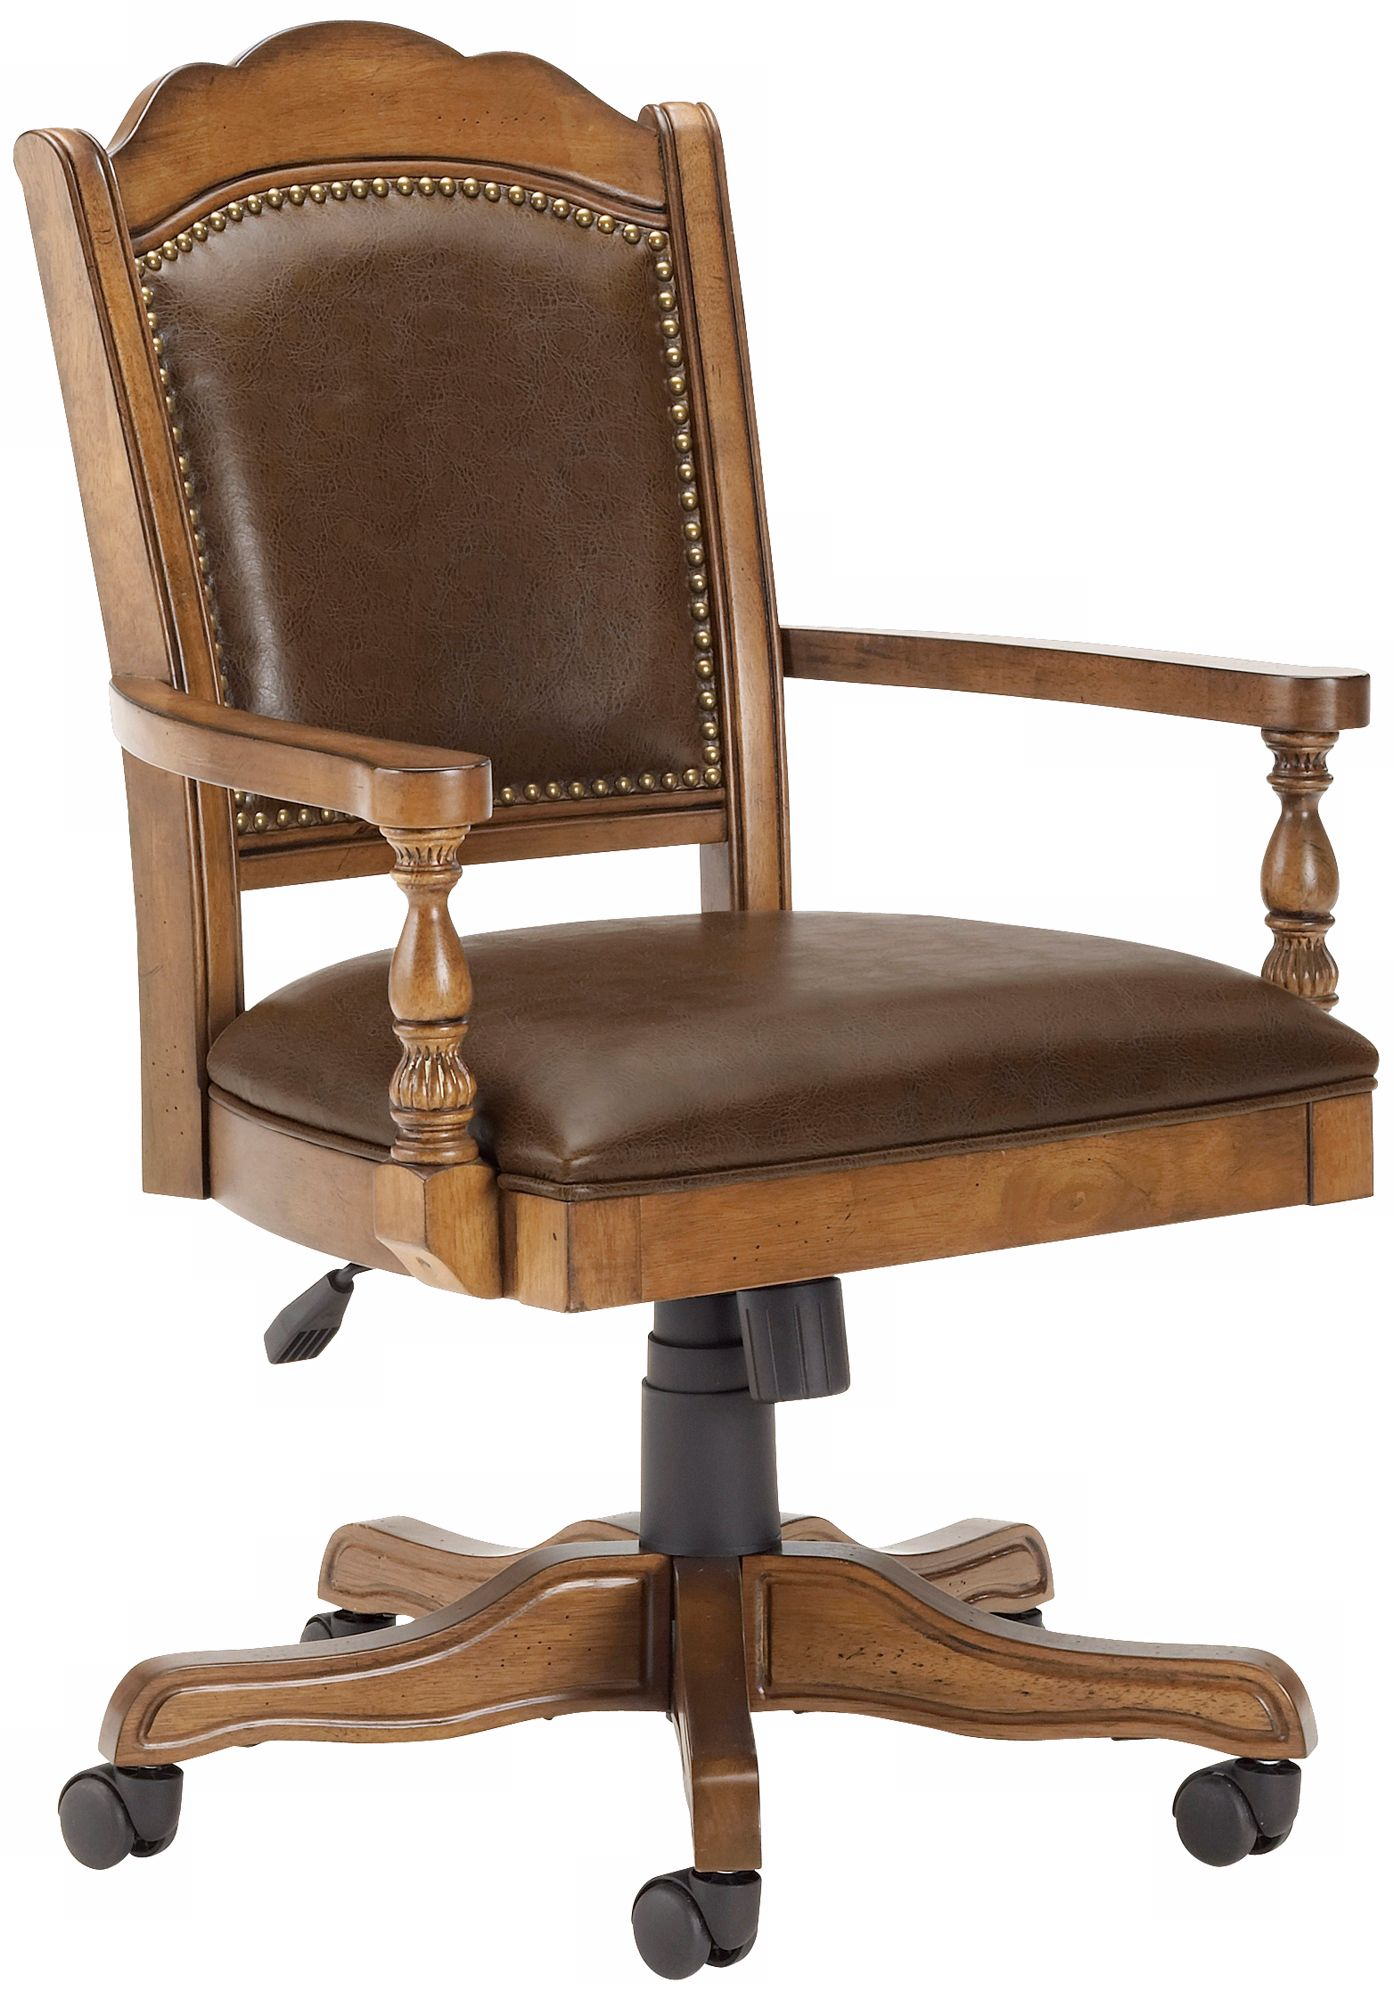 hillsdale nassau office chair - Office Desk Chairs